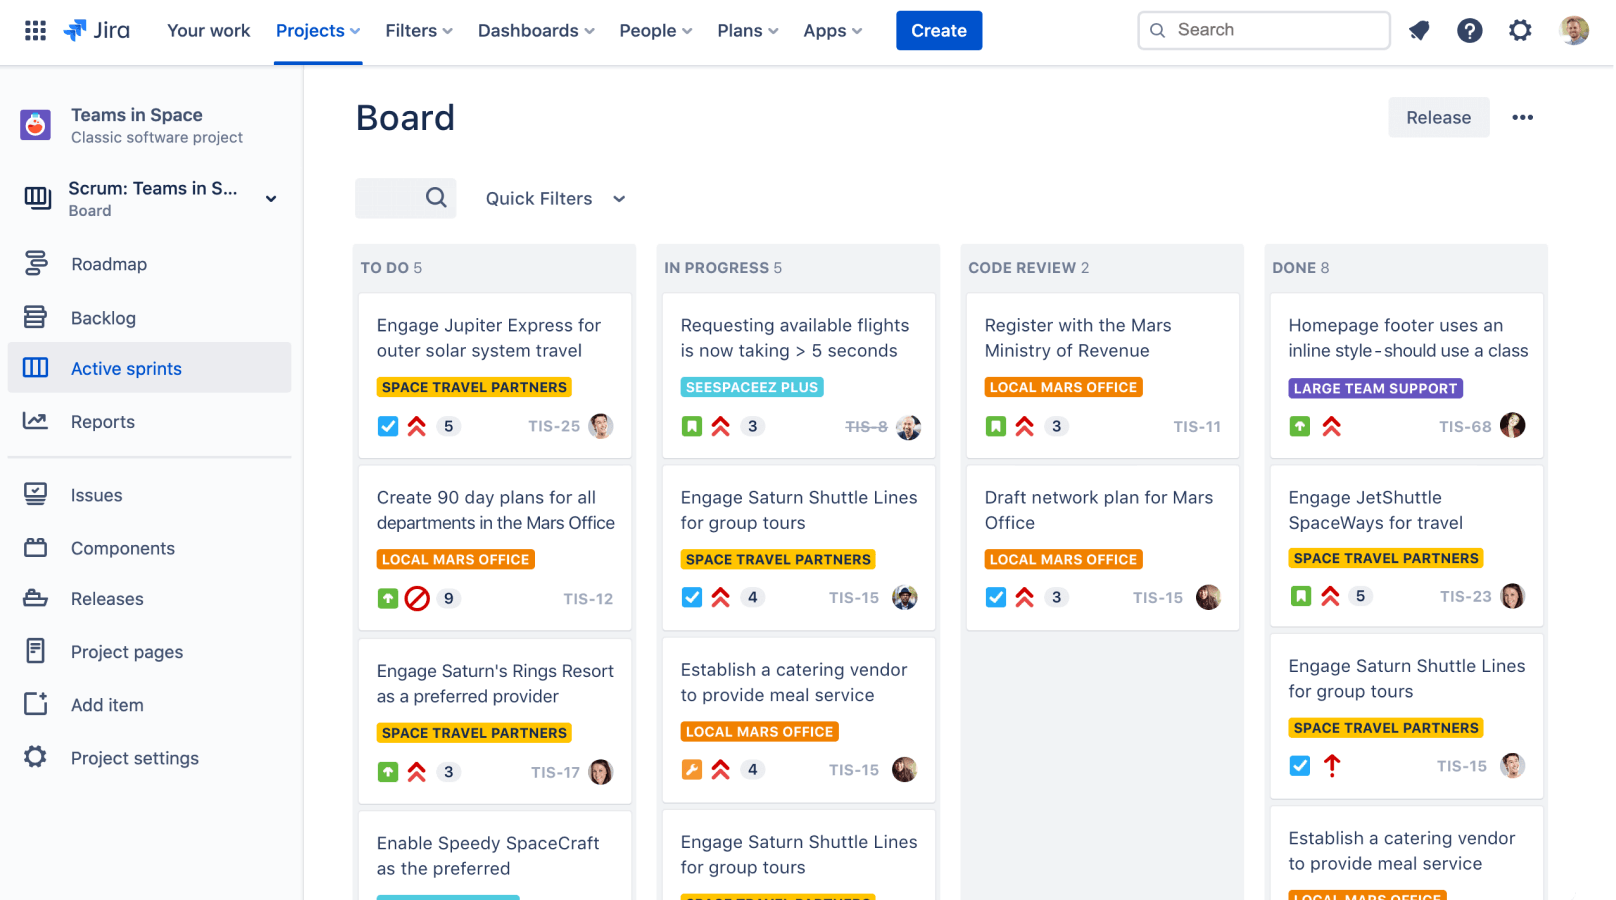 Jira project management kanban style board.